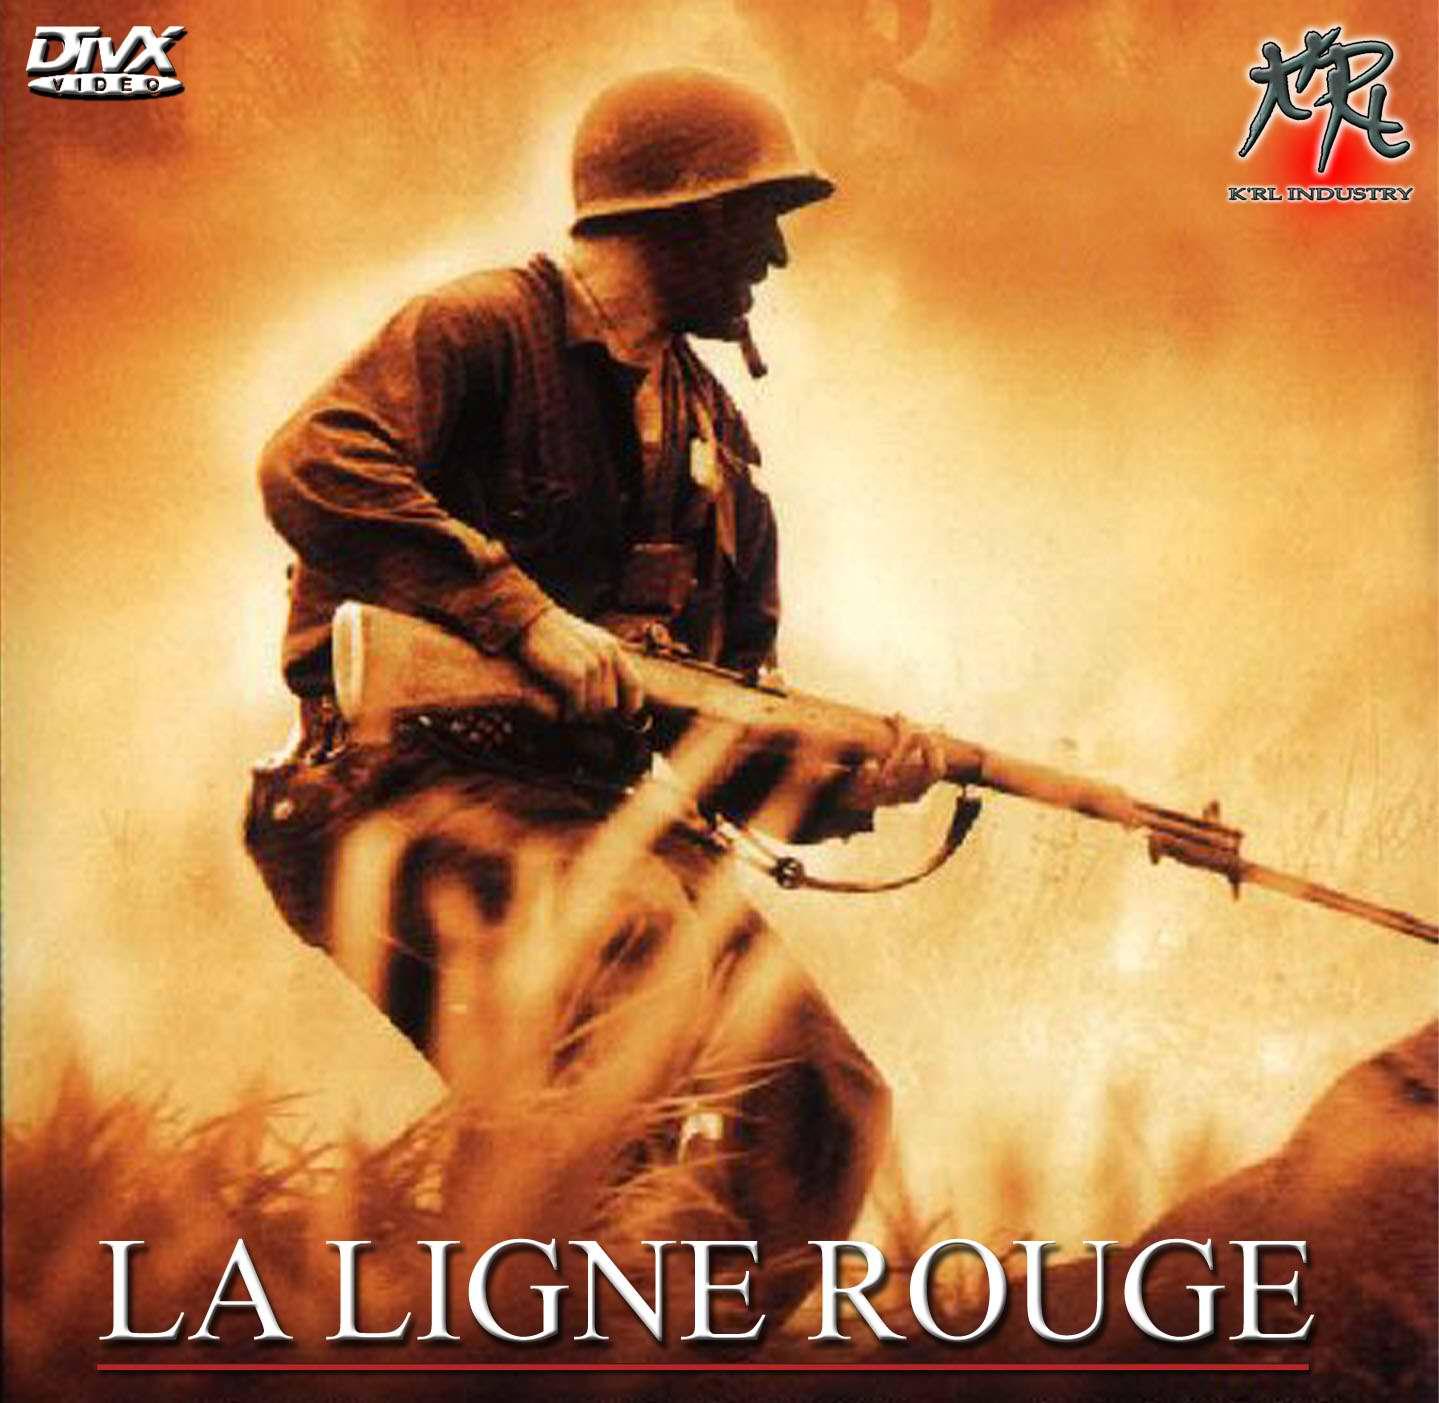 http://absolutedivxcovers.free.fr/Films/La%20Ligne%20Rouge%20Front.jpg